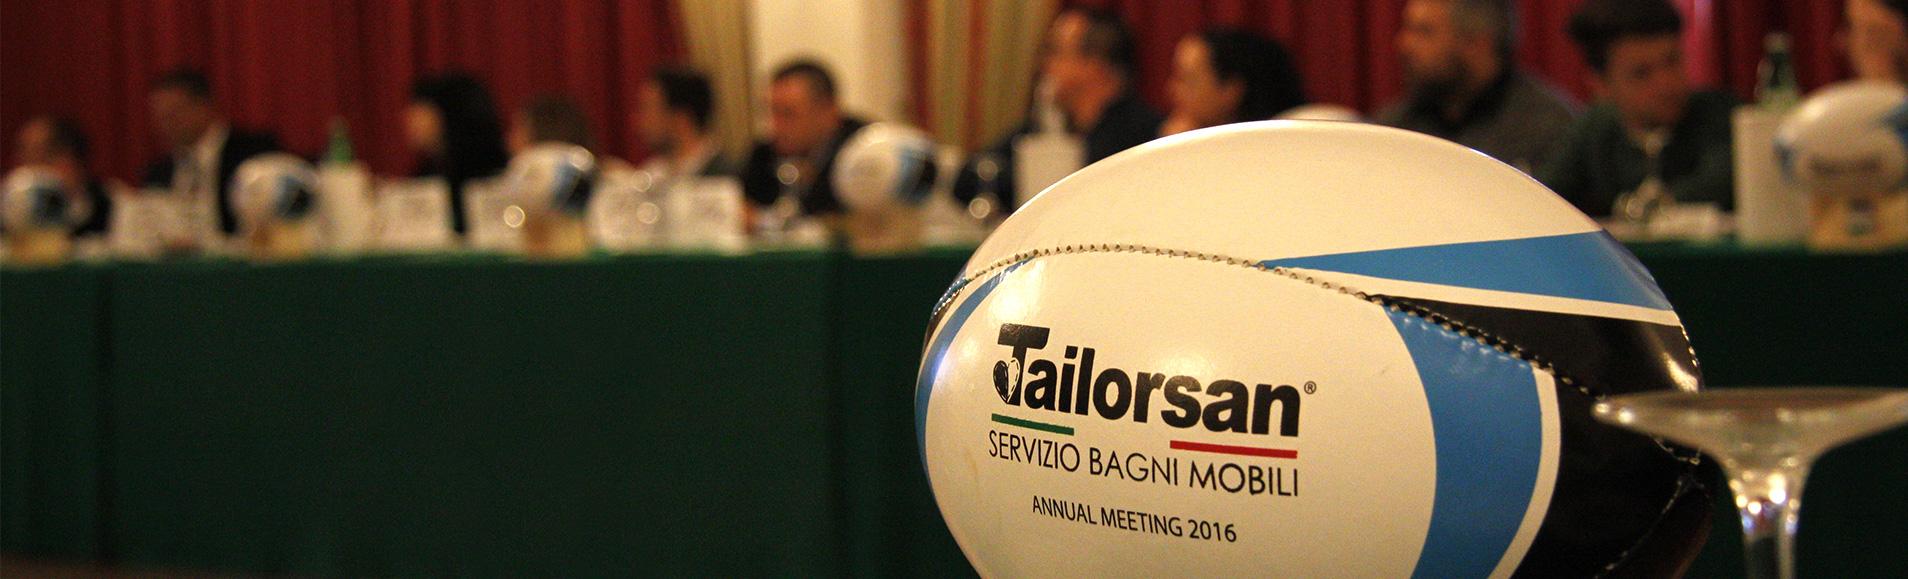 Convention 2016 tailorsan bagni chimici tailorsan noleggio wc chimici - Noleggio bagni chimici firenze ...